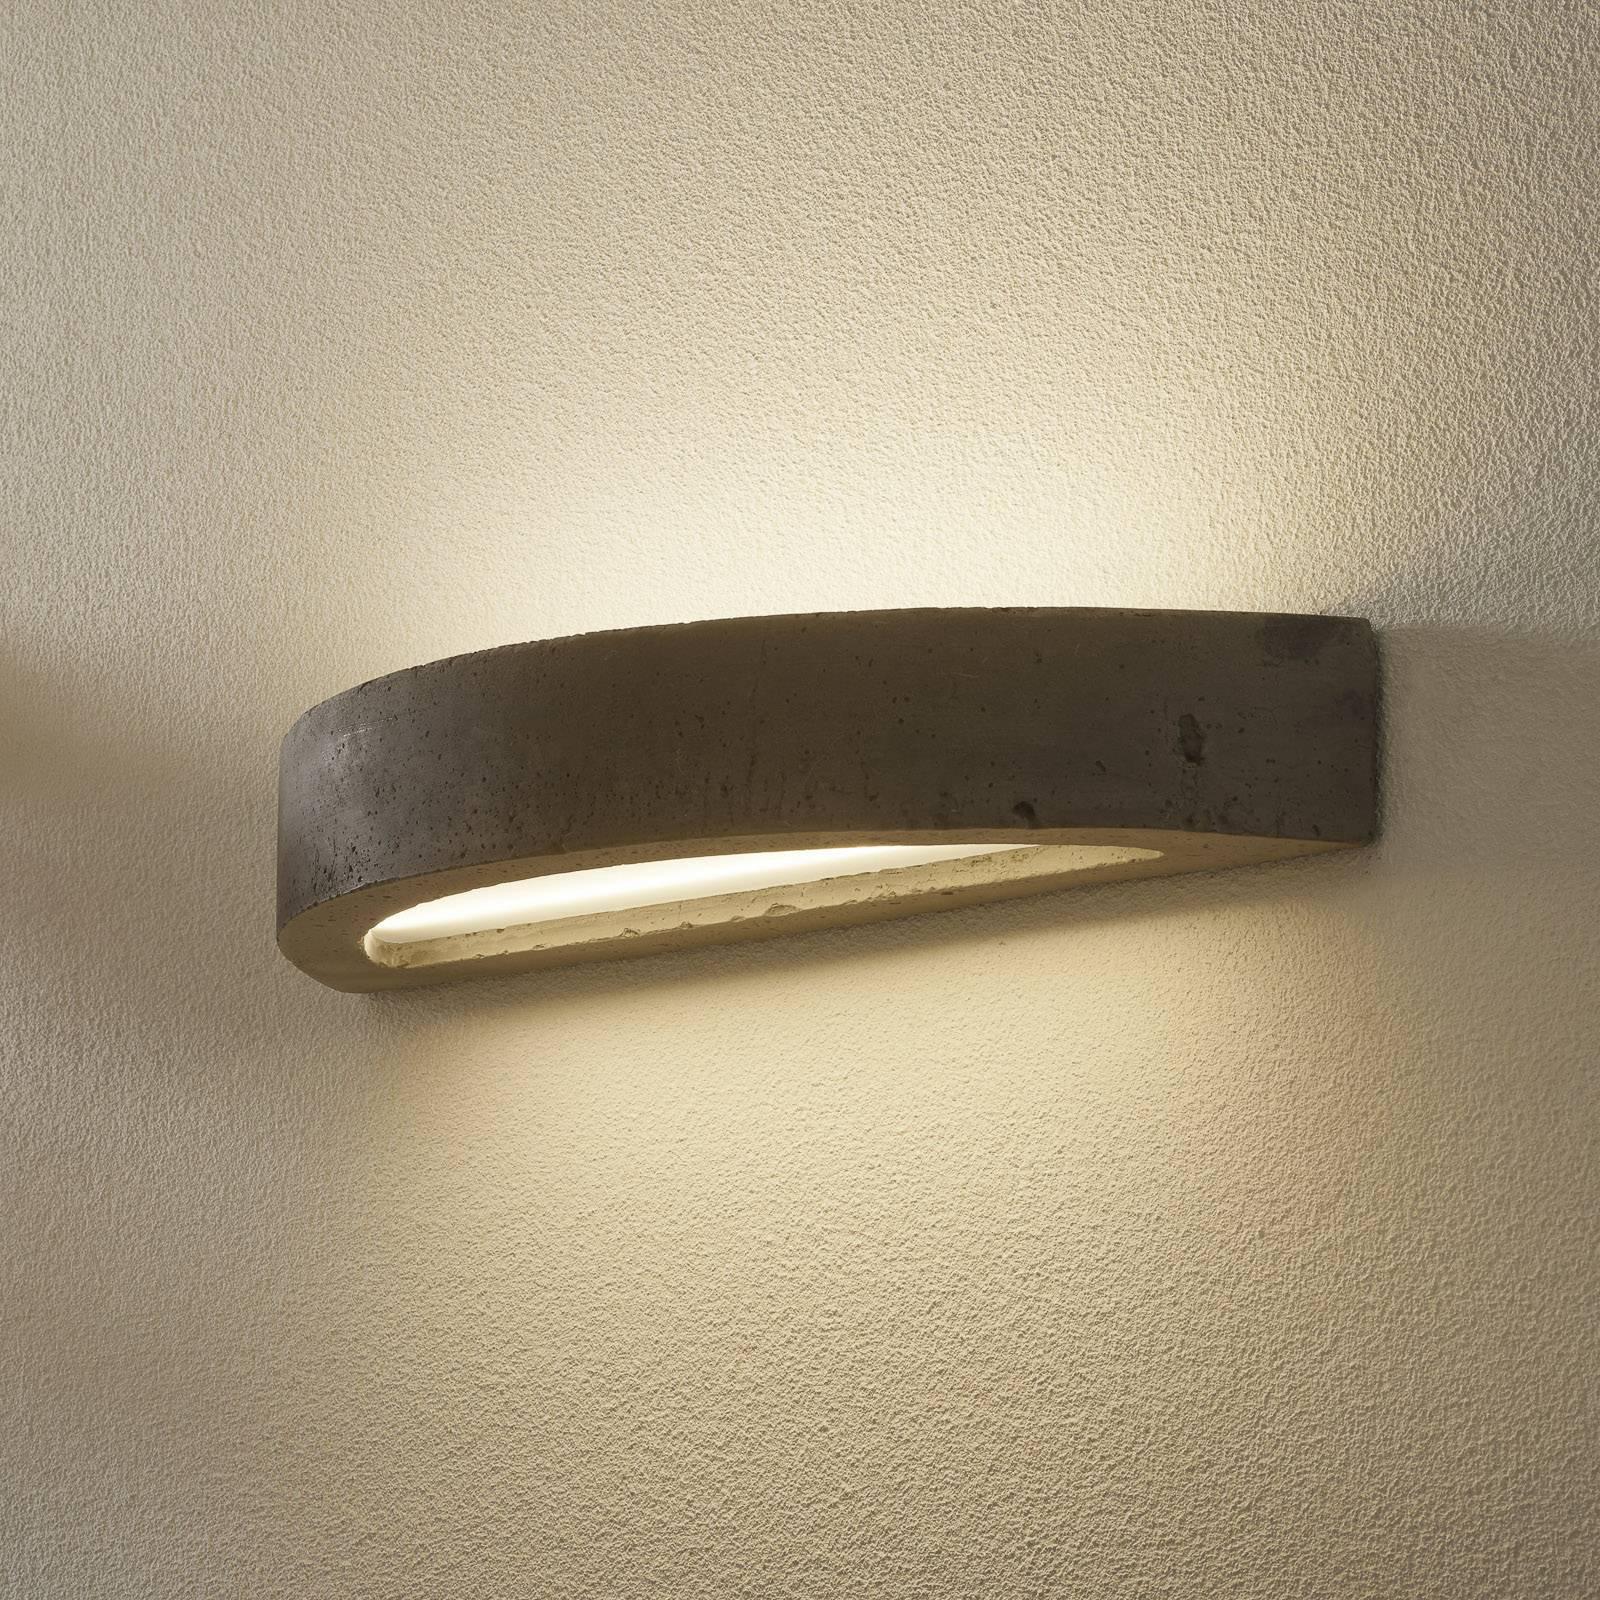 LED-vegglampe 2455 betong 3 000 K dimbar